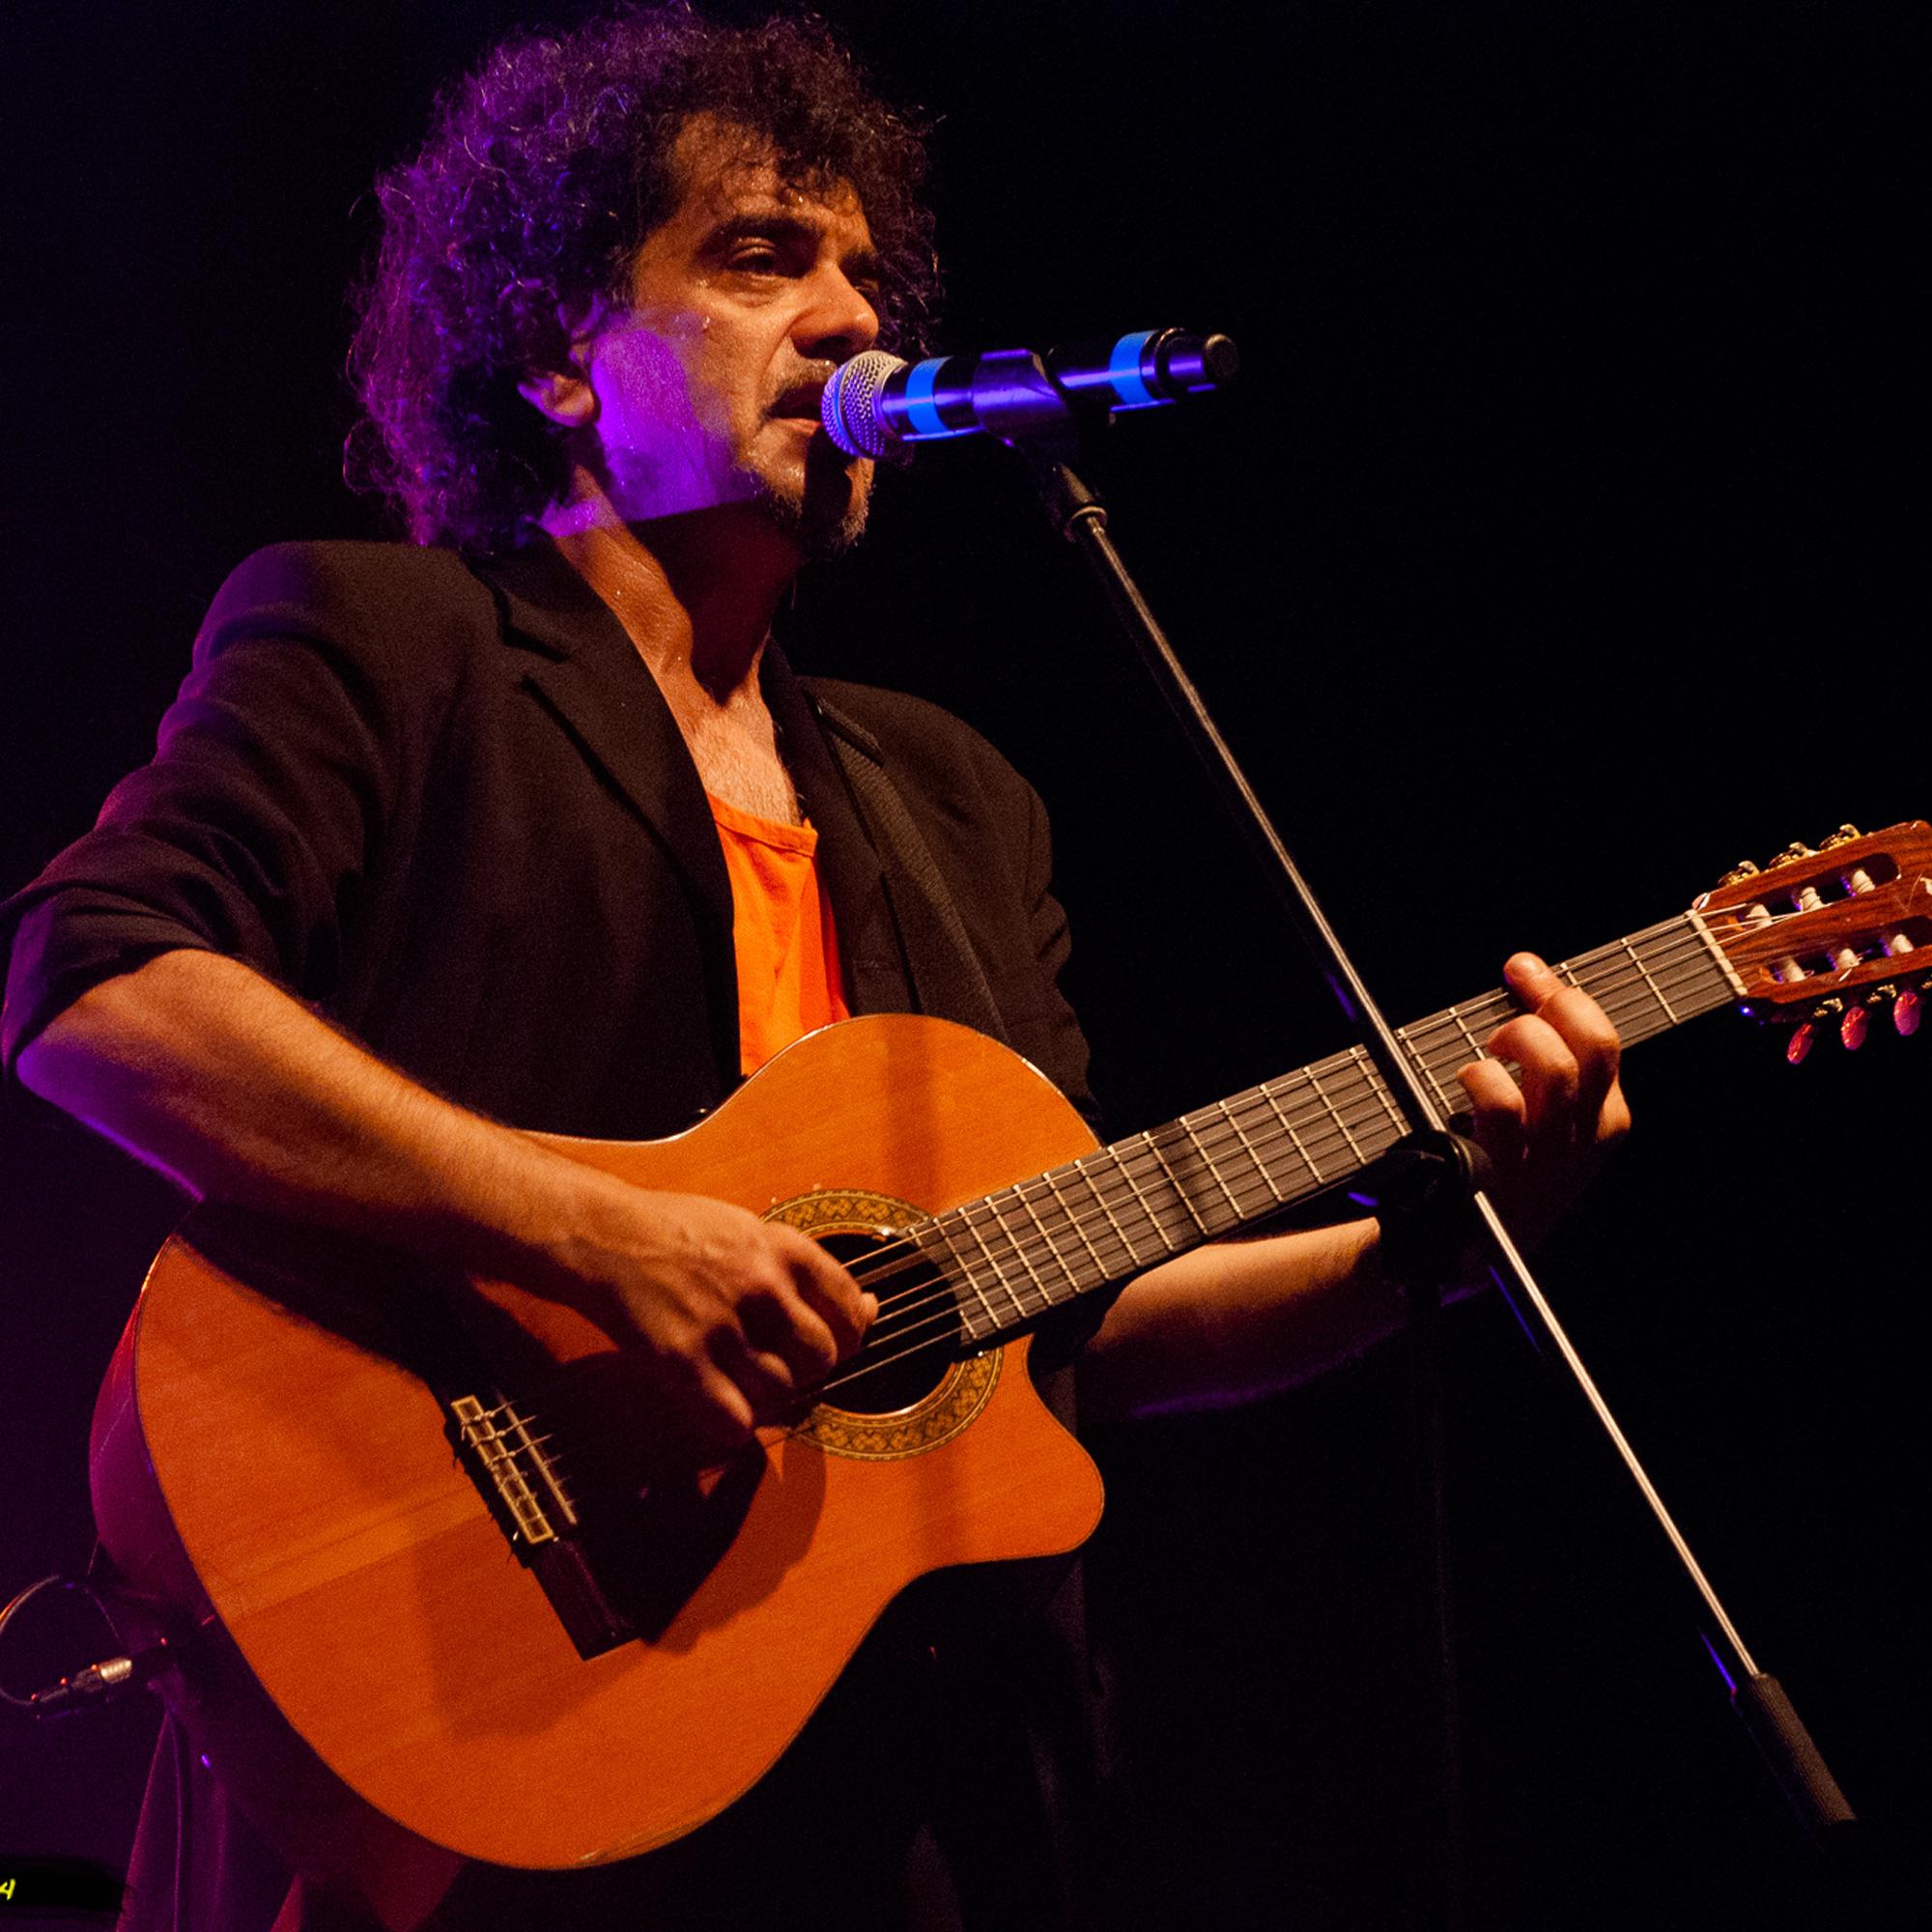 MIrco Menna - Foto: Manuel Garibaldi